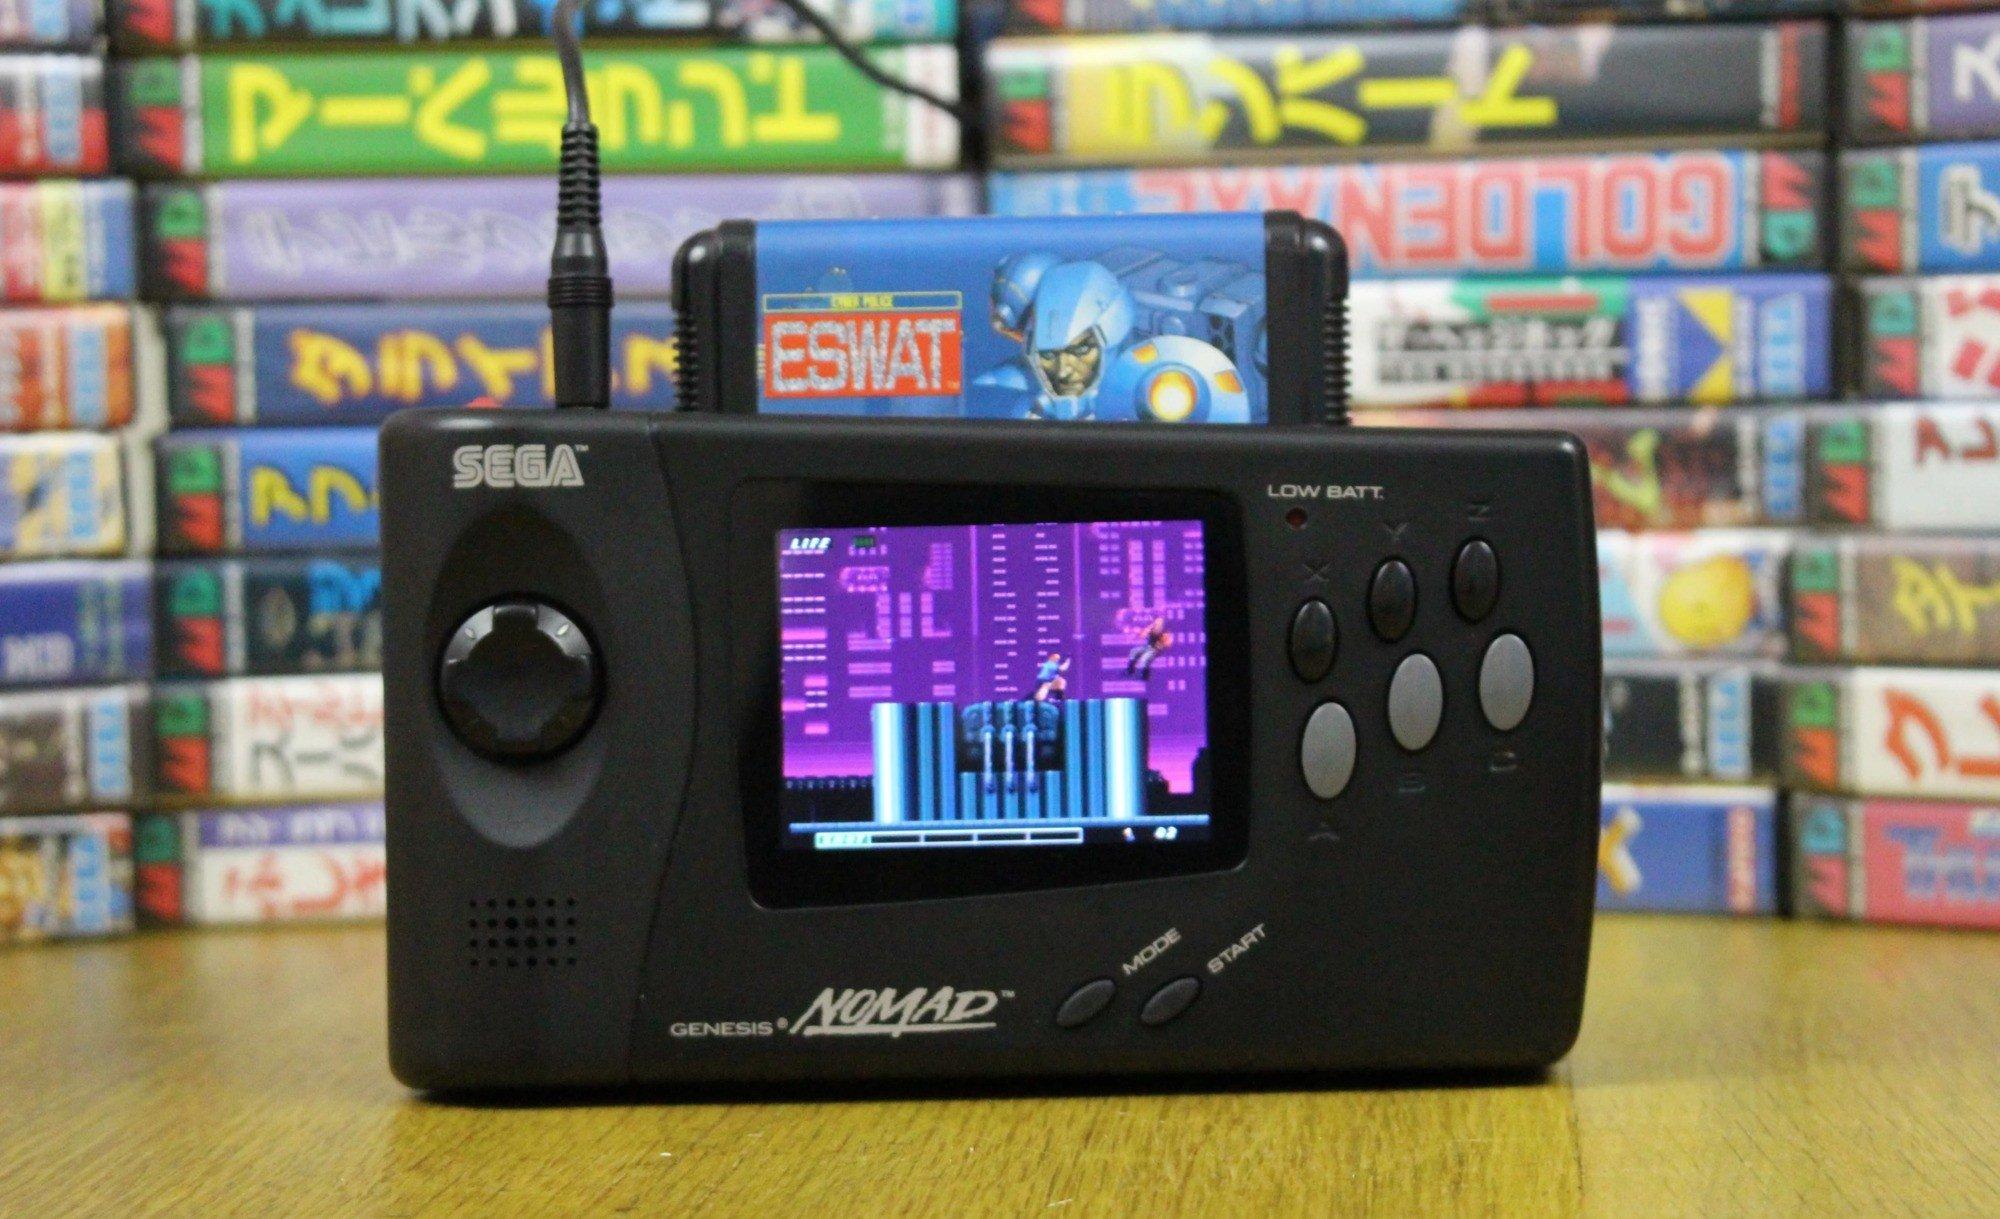 Looks Like Retro-Bit Is Resurrecting Sega's Switch-Like